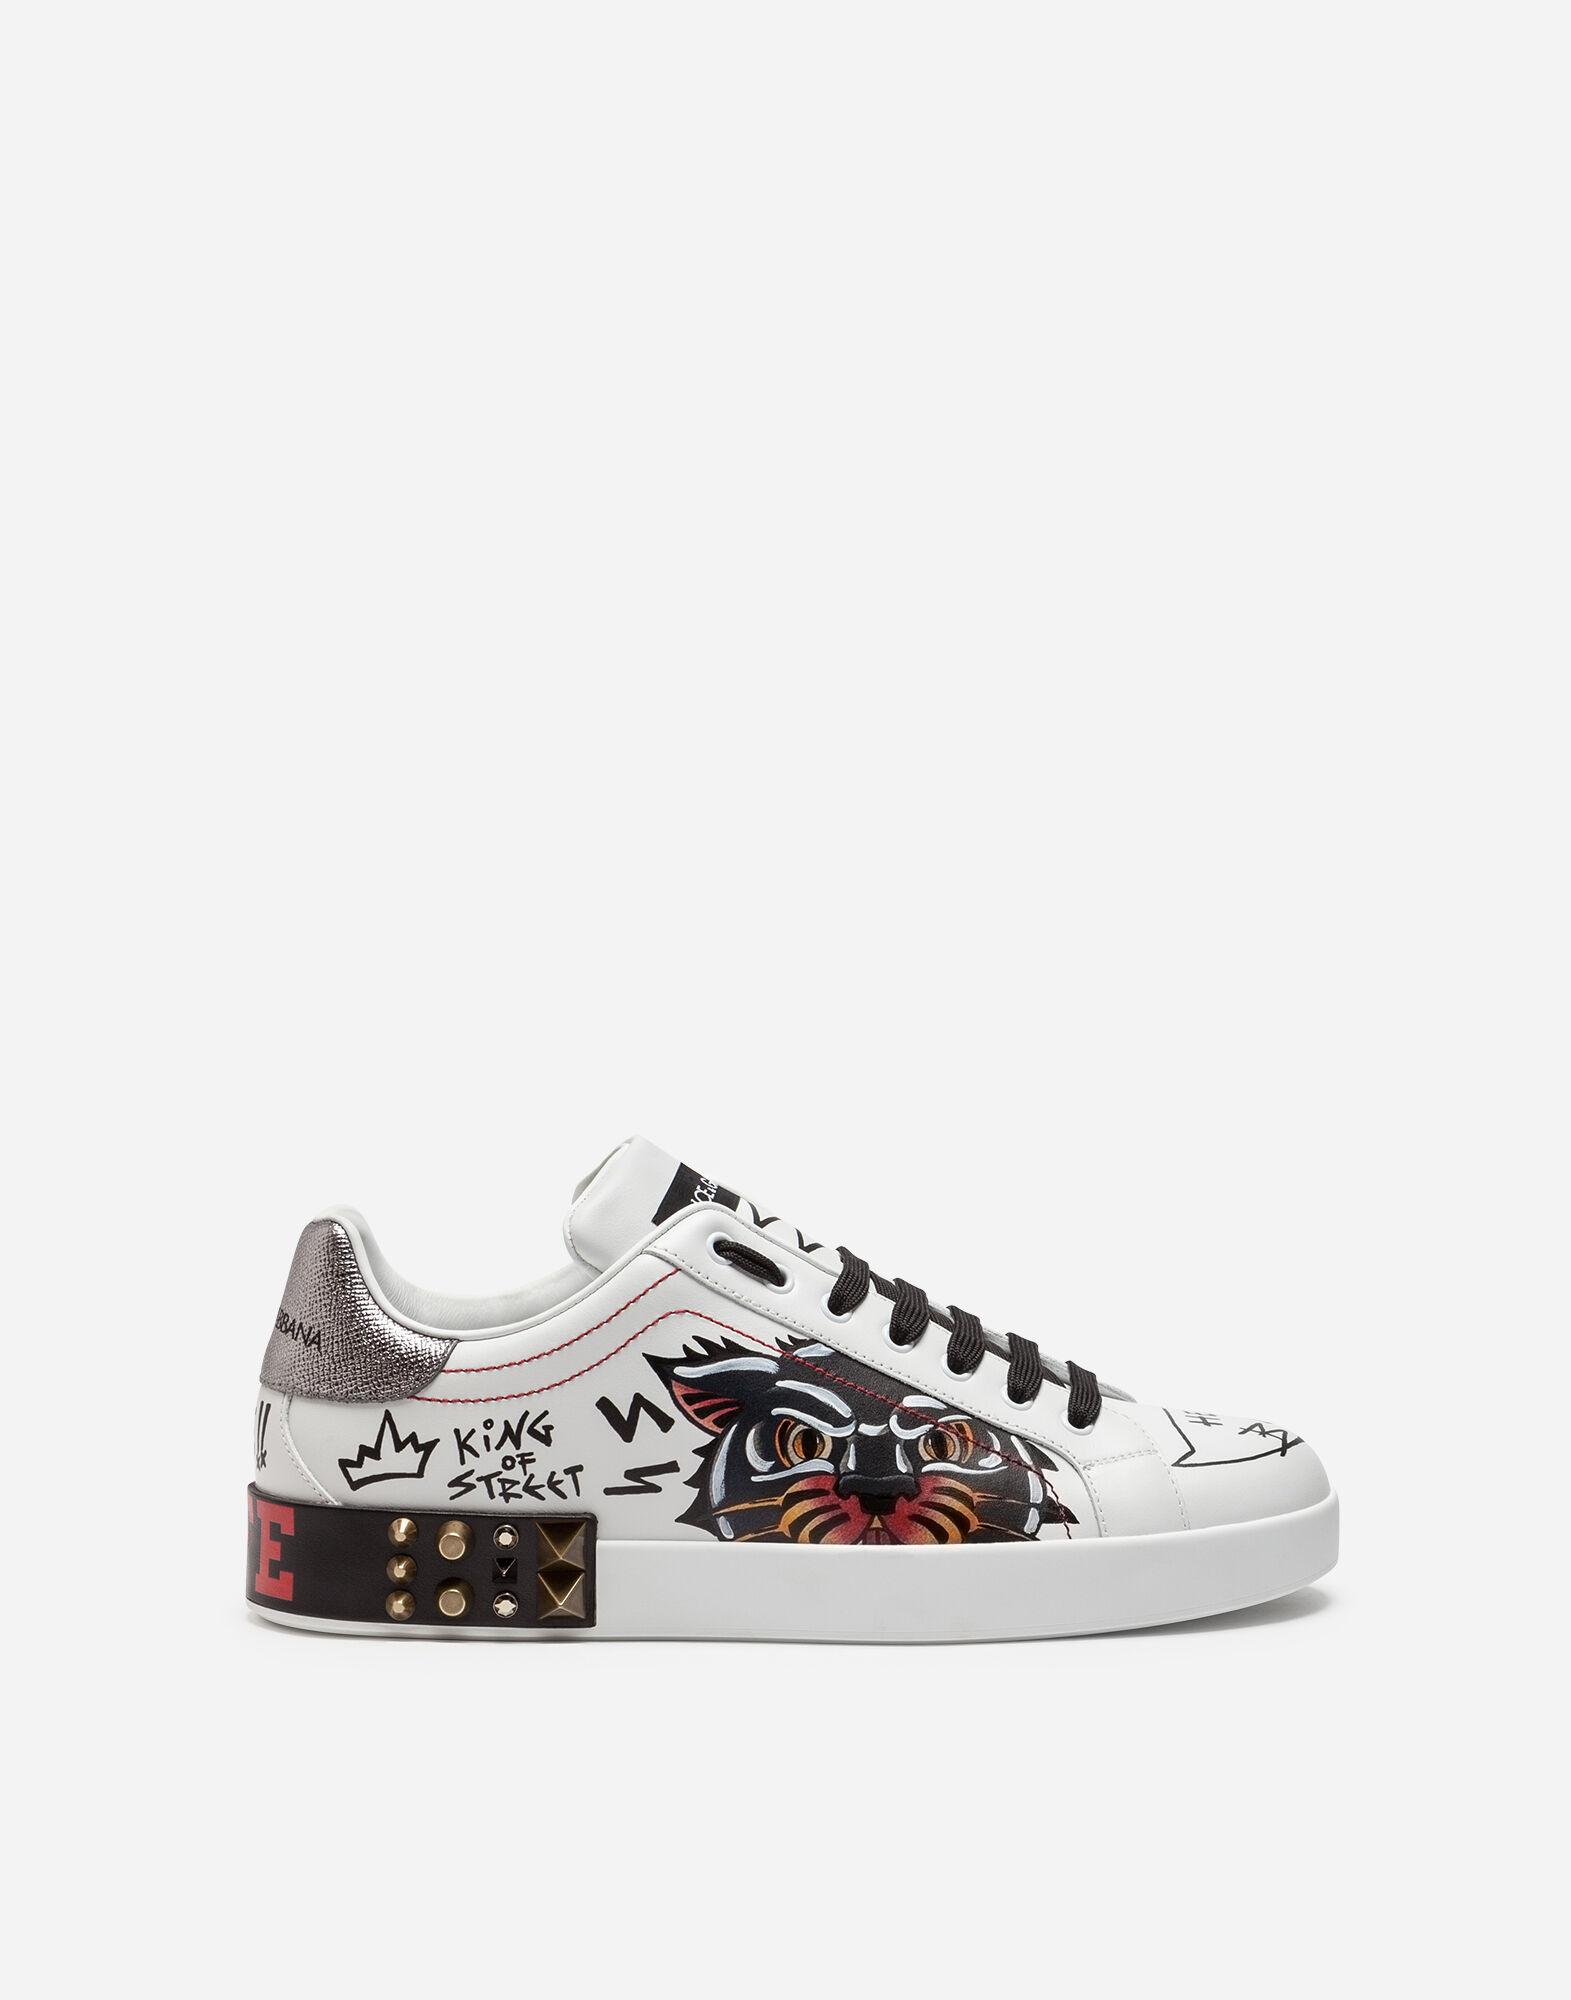 Dolce & Gabbana Portofino sneakers with appliqués 6TylG